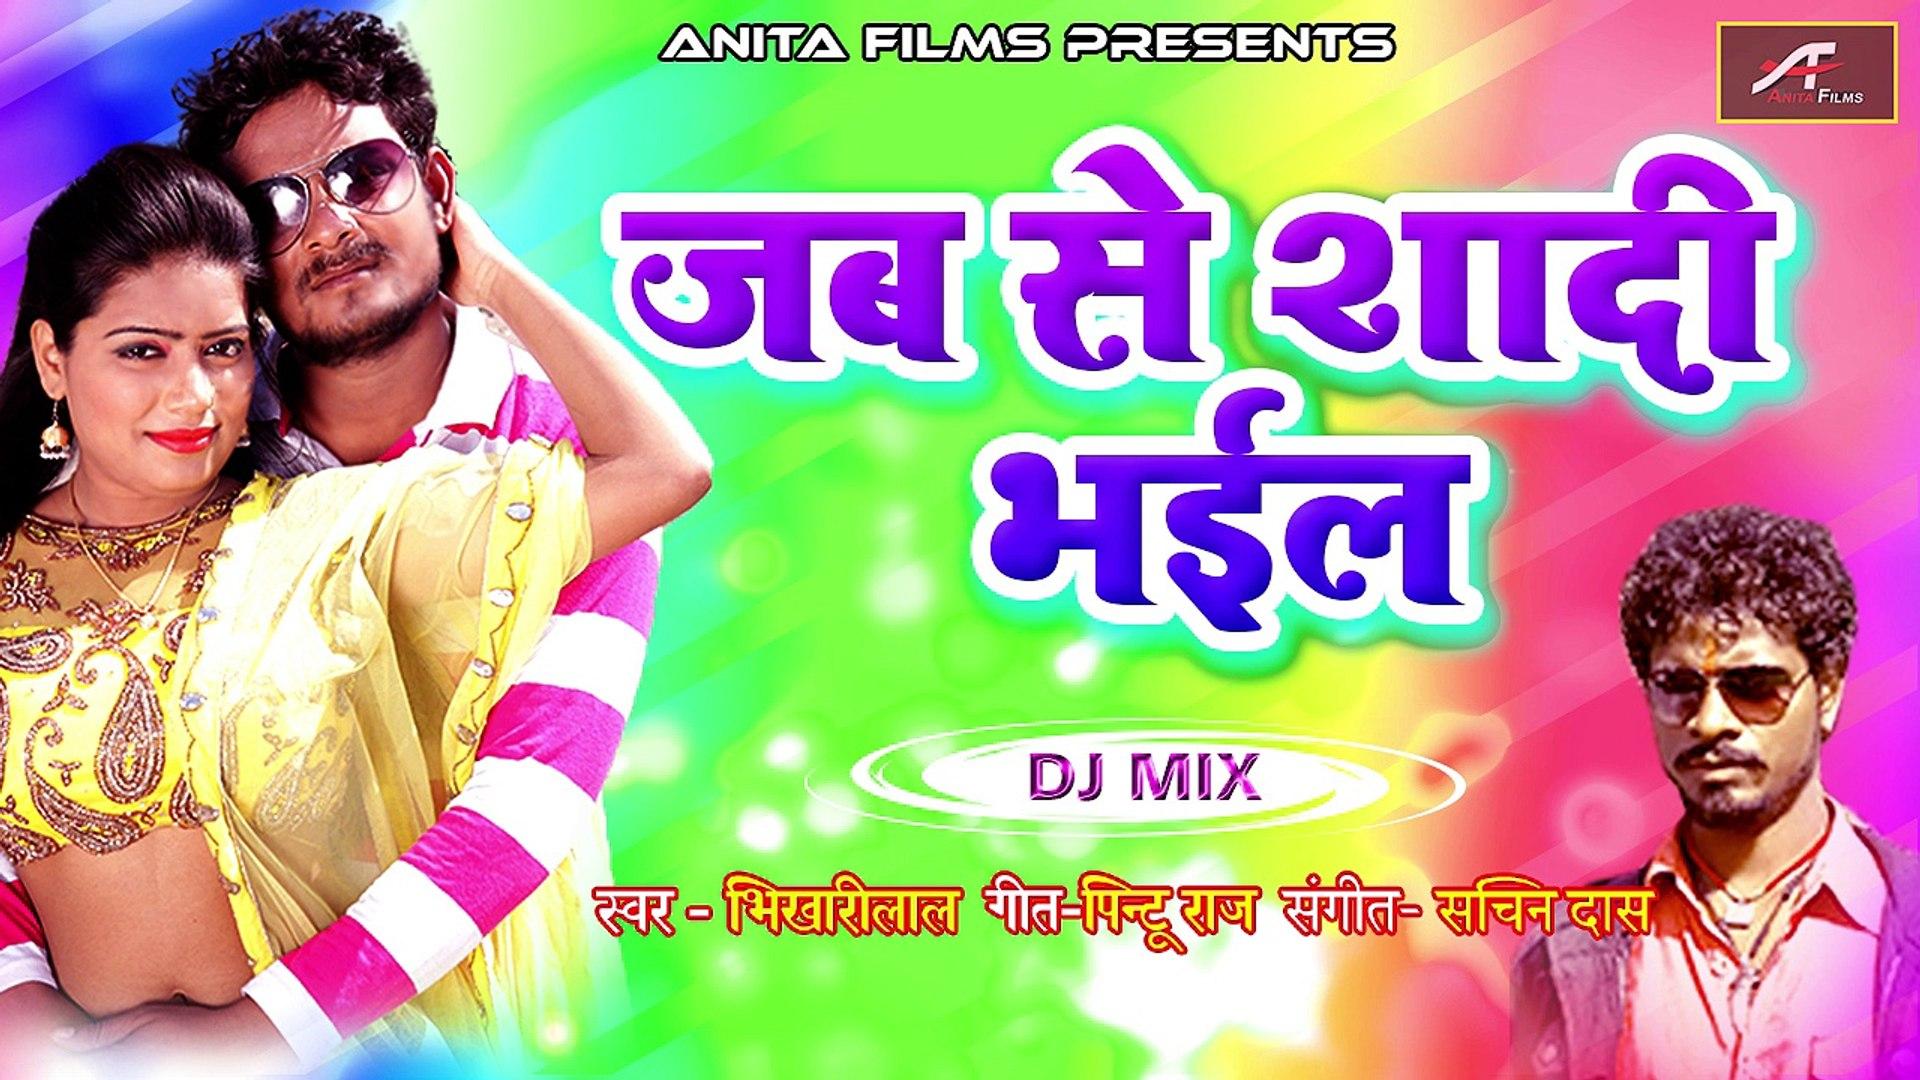 2018 Latest - Dj Mix | Jabase Shadi Bhail | Full Audio | Bhojpuri Dj Mix  Song | New Mp3 Song | Anita Films | Bhojpuri Gana